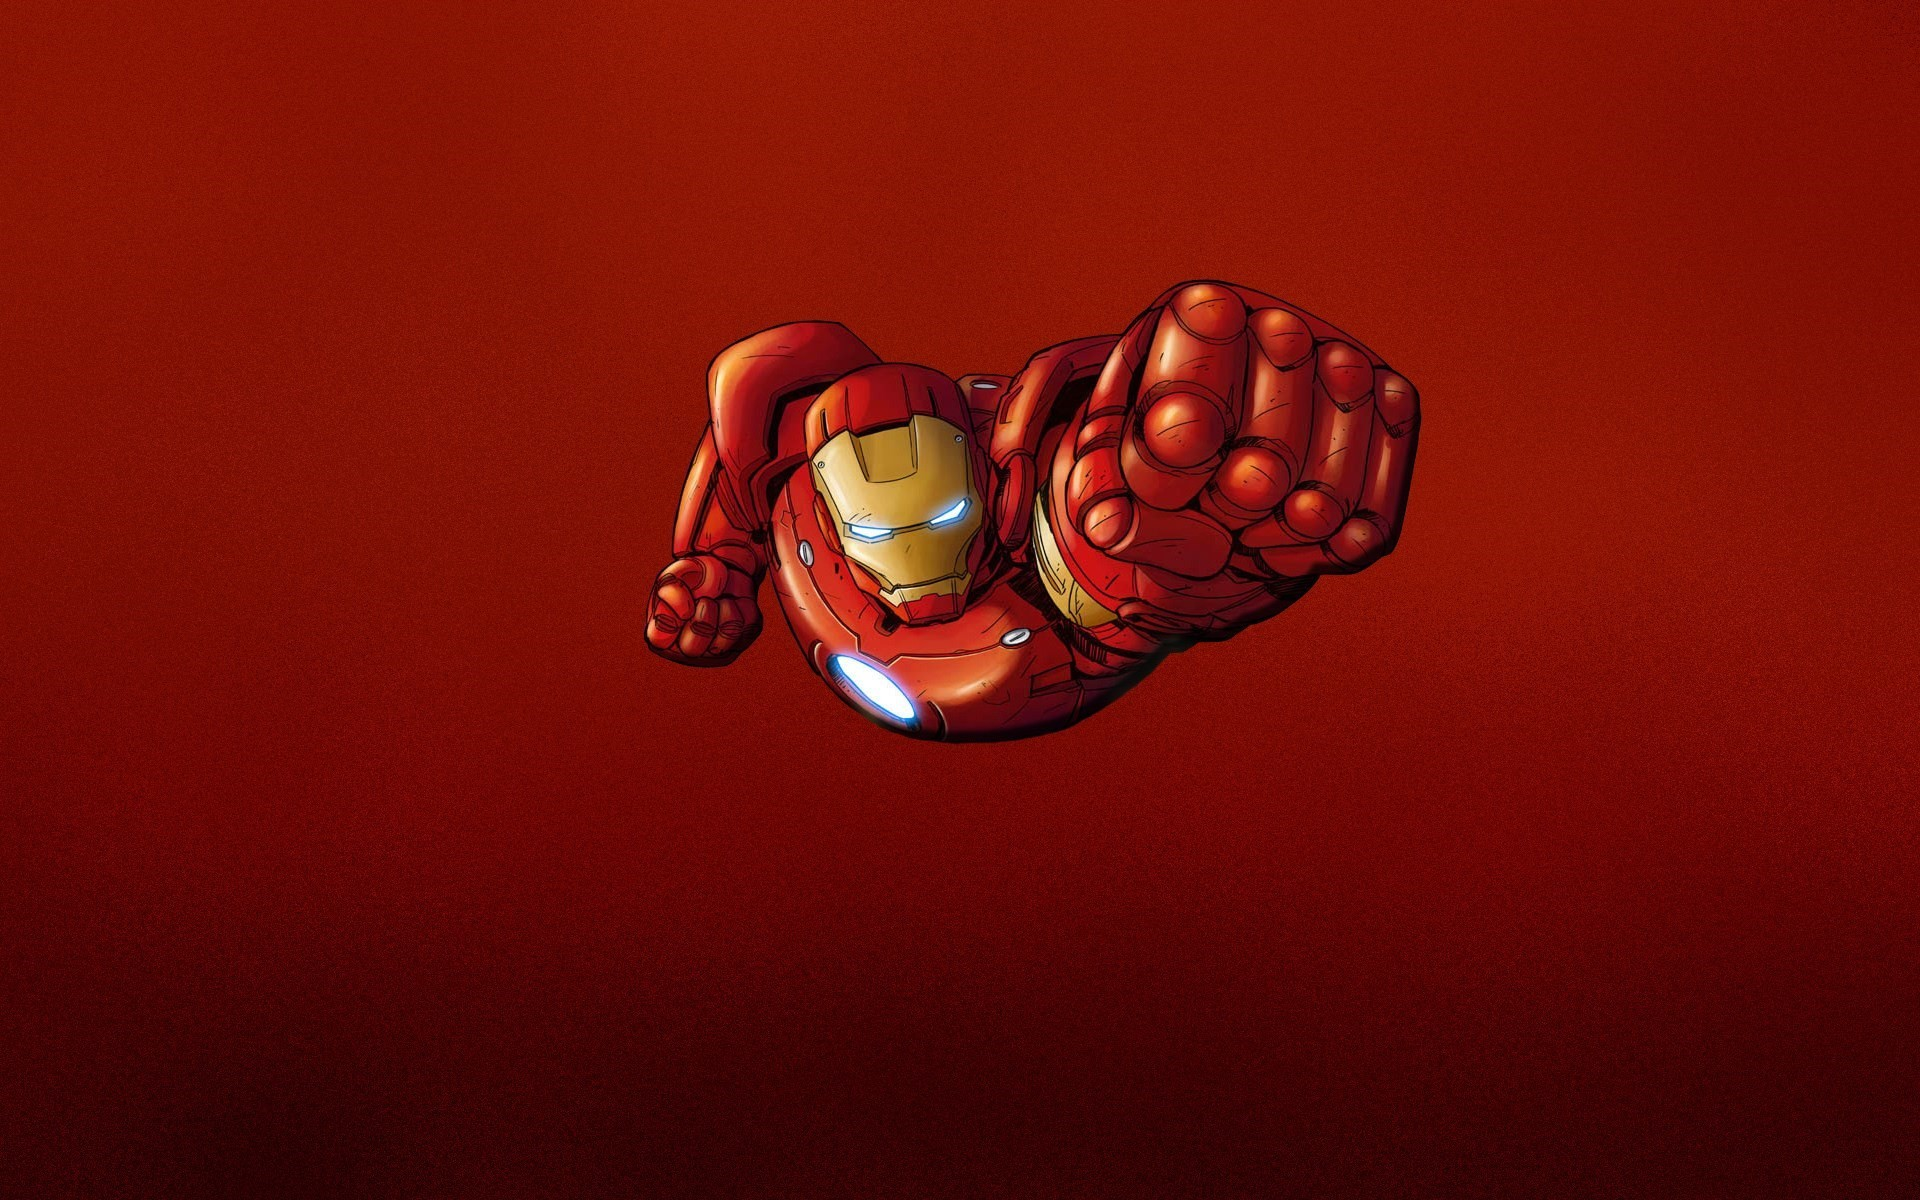 Iron Man Wallpaper 34447: Sfondi Iron Man (84+ Immagini